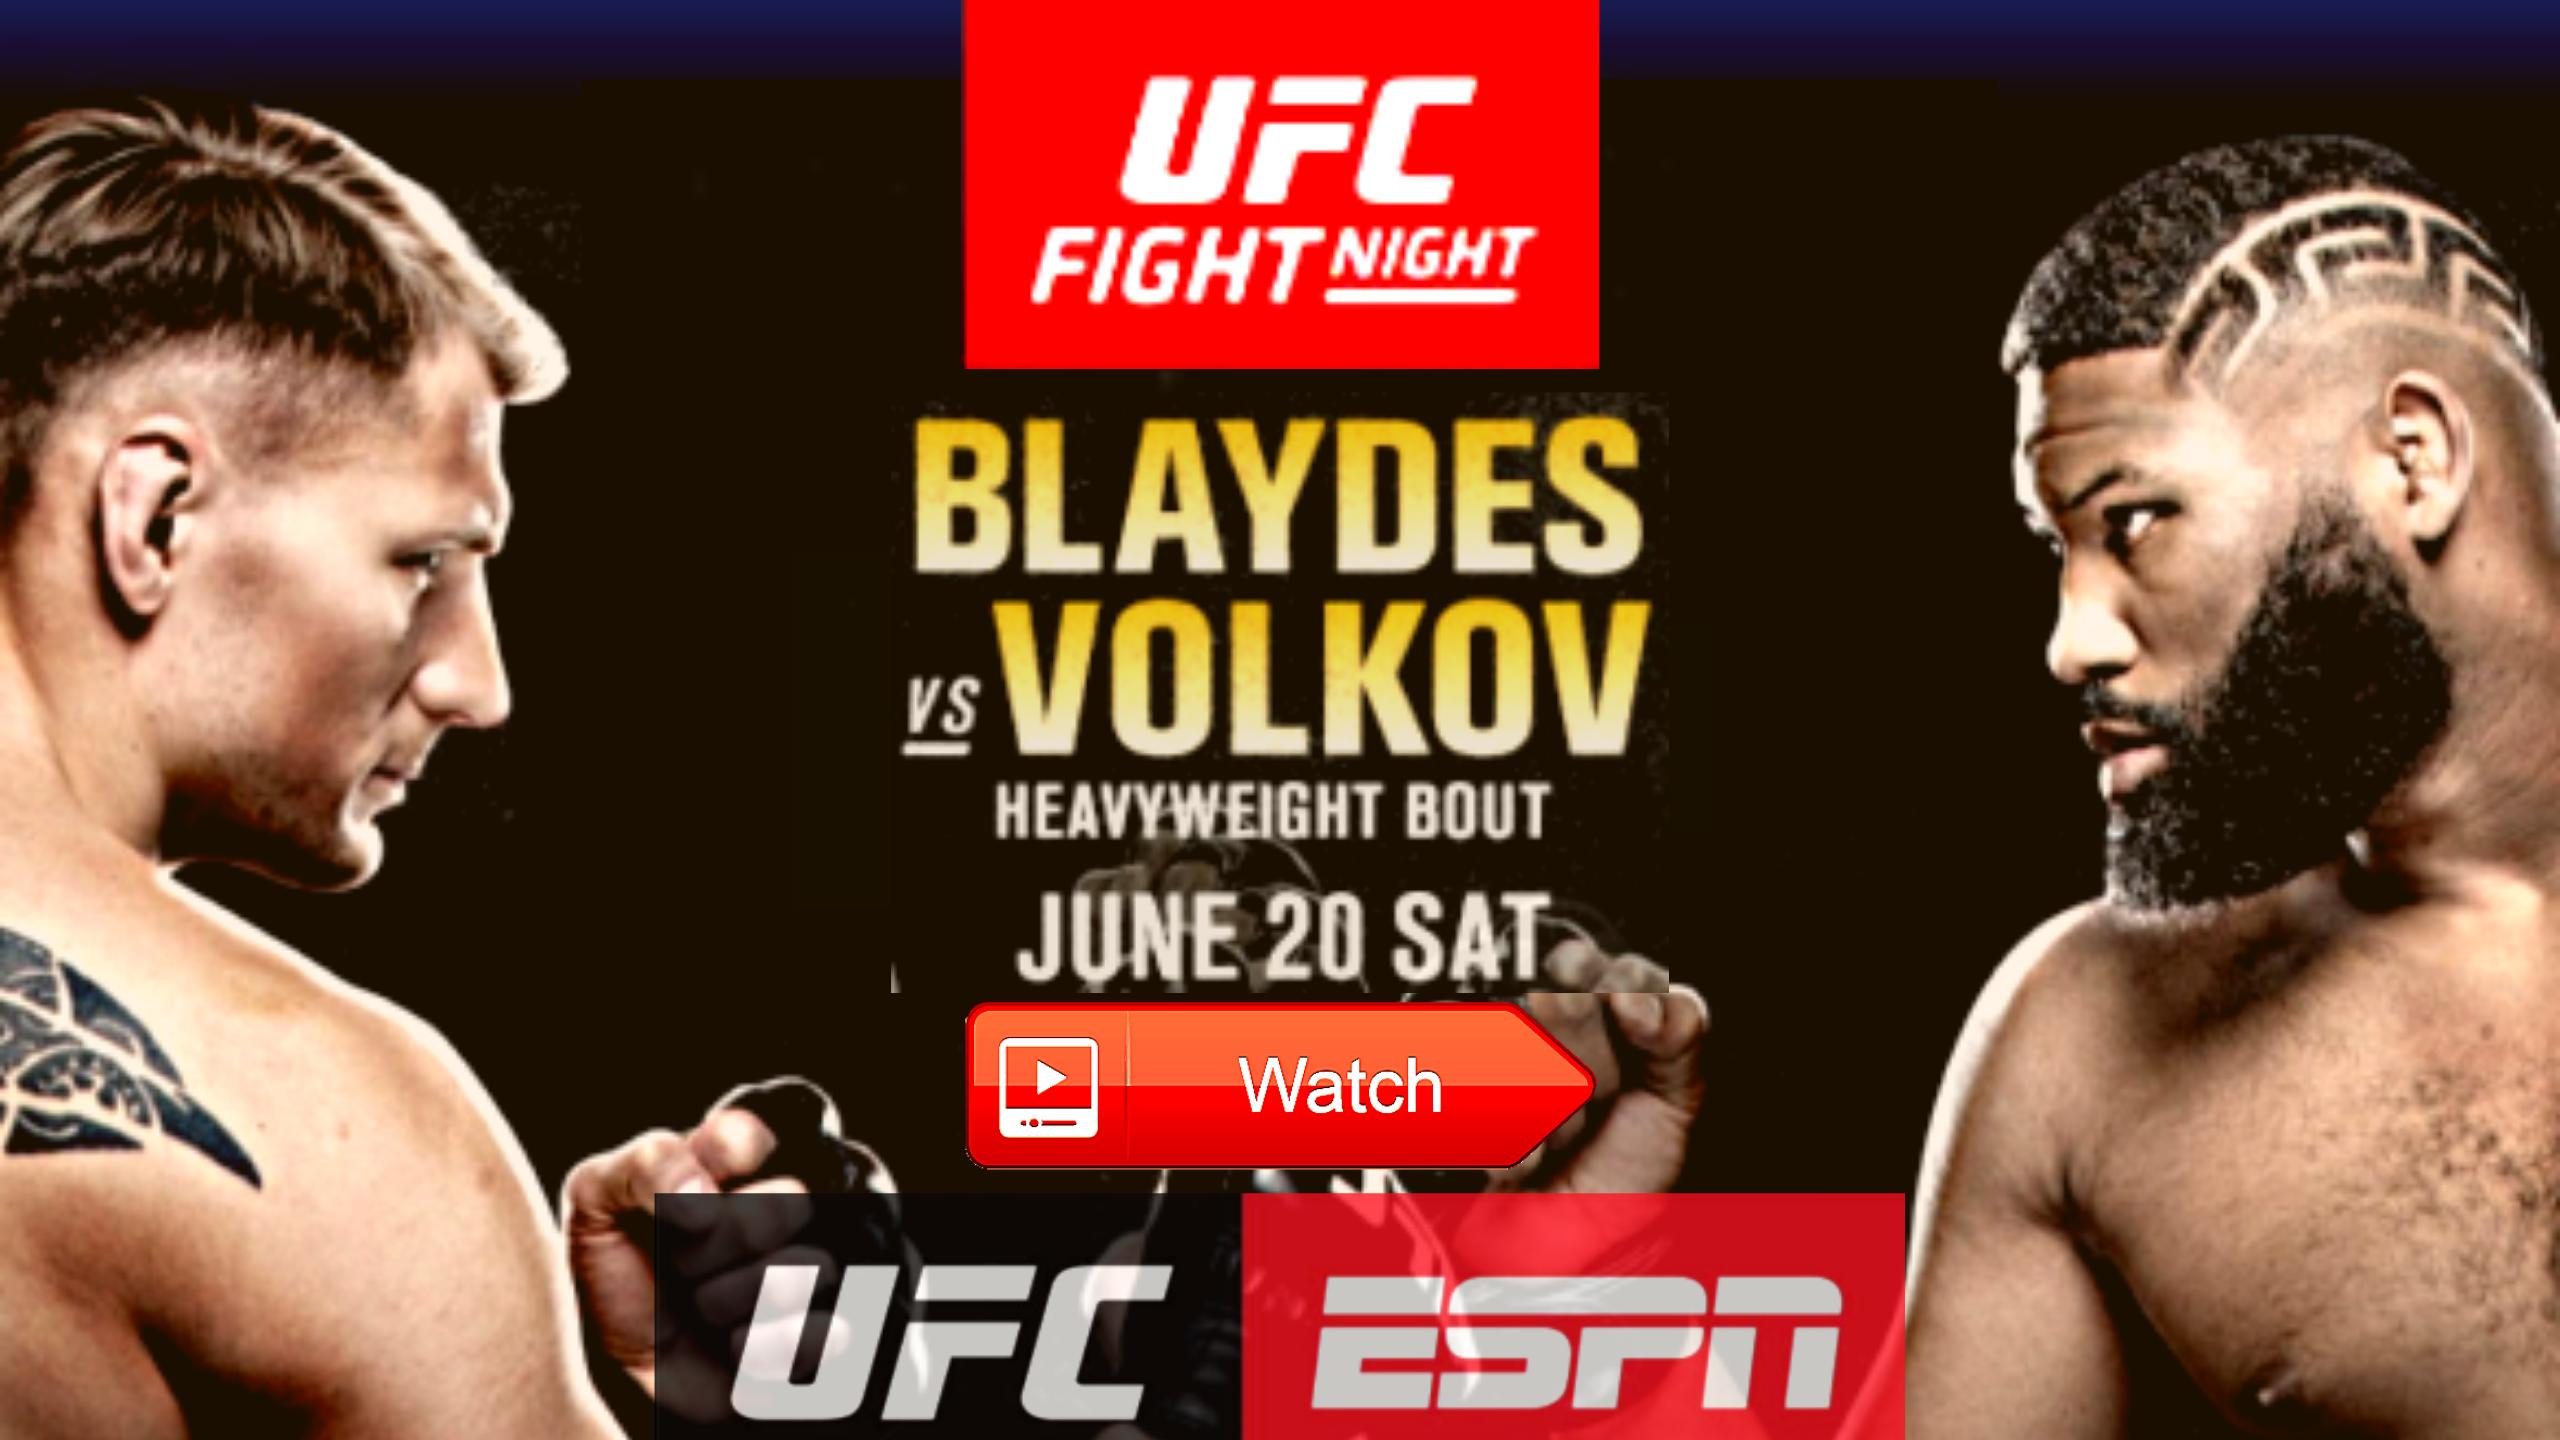 Live Ufc Fight Night Blaydes Vs Volkov Live Curtis Blaydes Vs Alexander Volkov Live Stream Ufc Fight Night Ufc Streaming